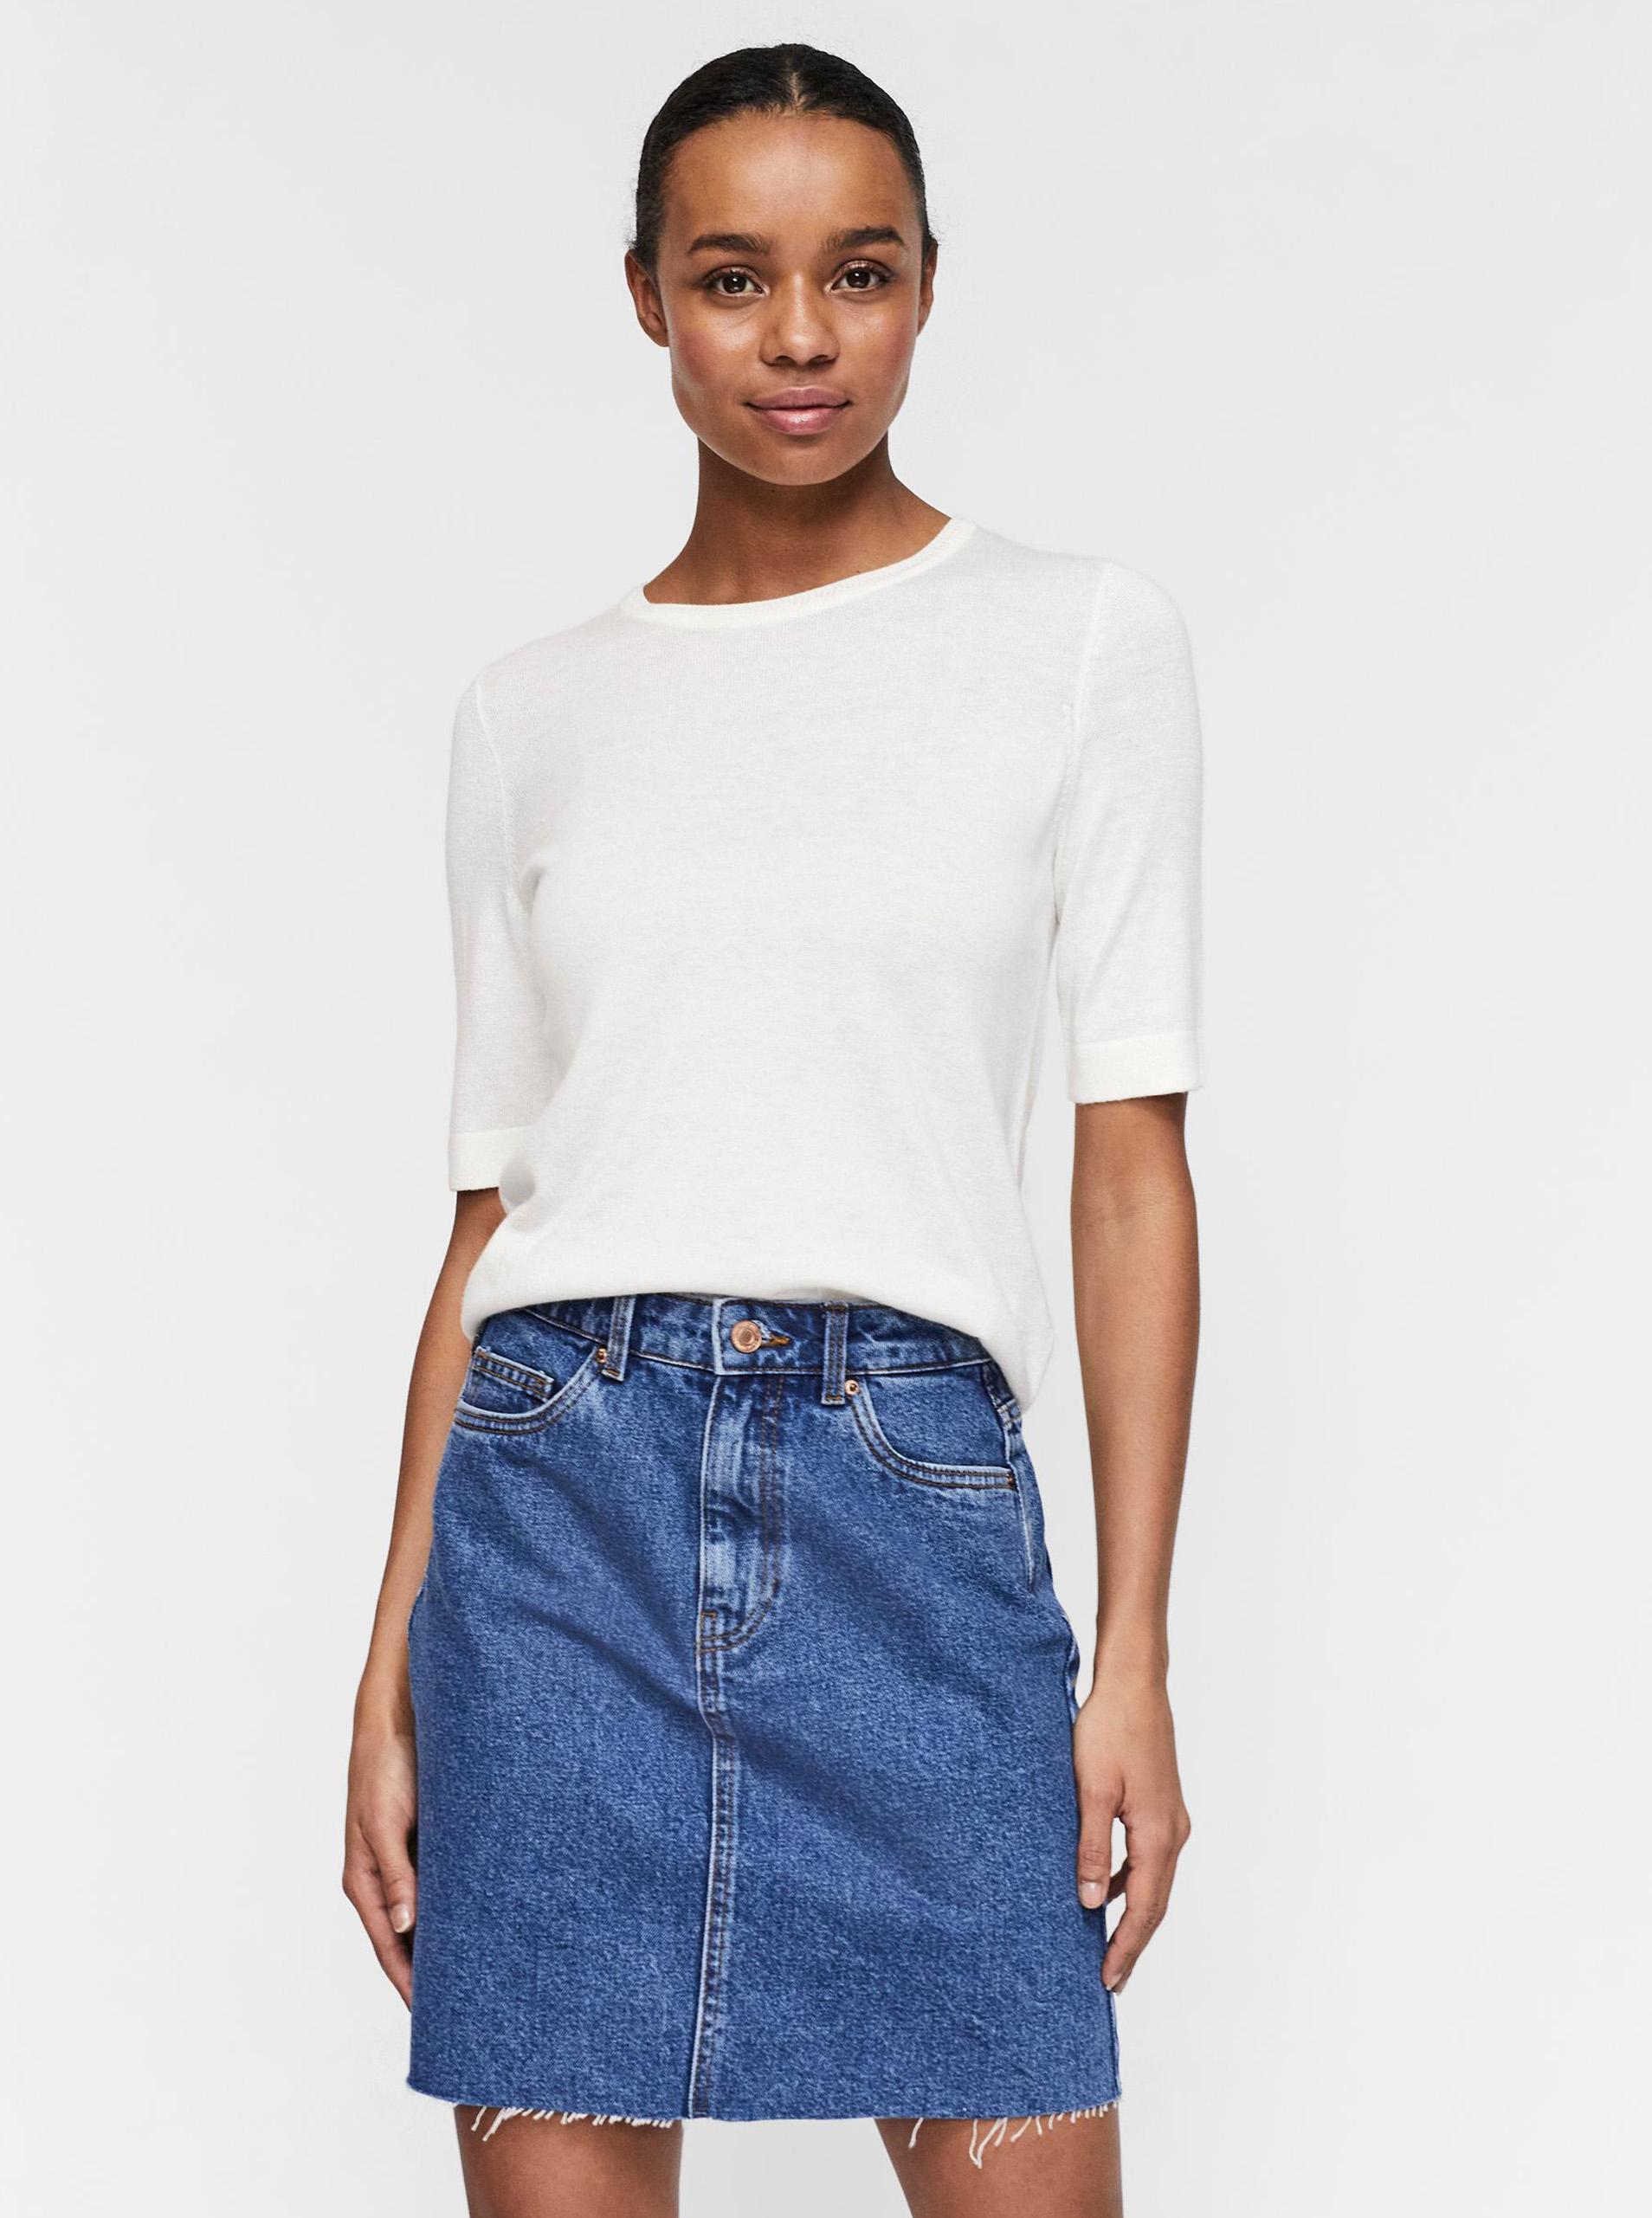 Vero Moda cream / cream T-shirt Silke